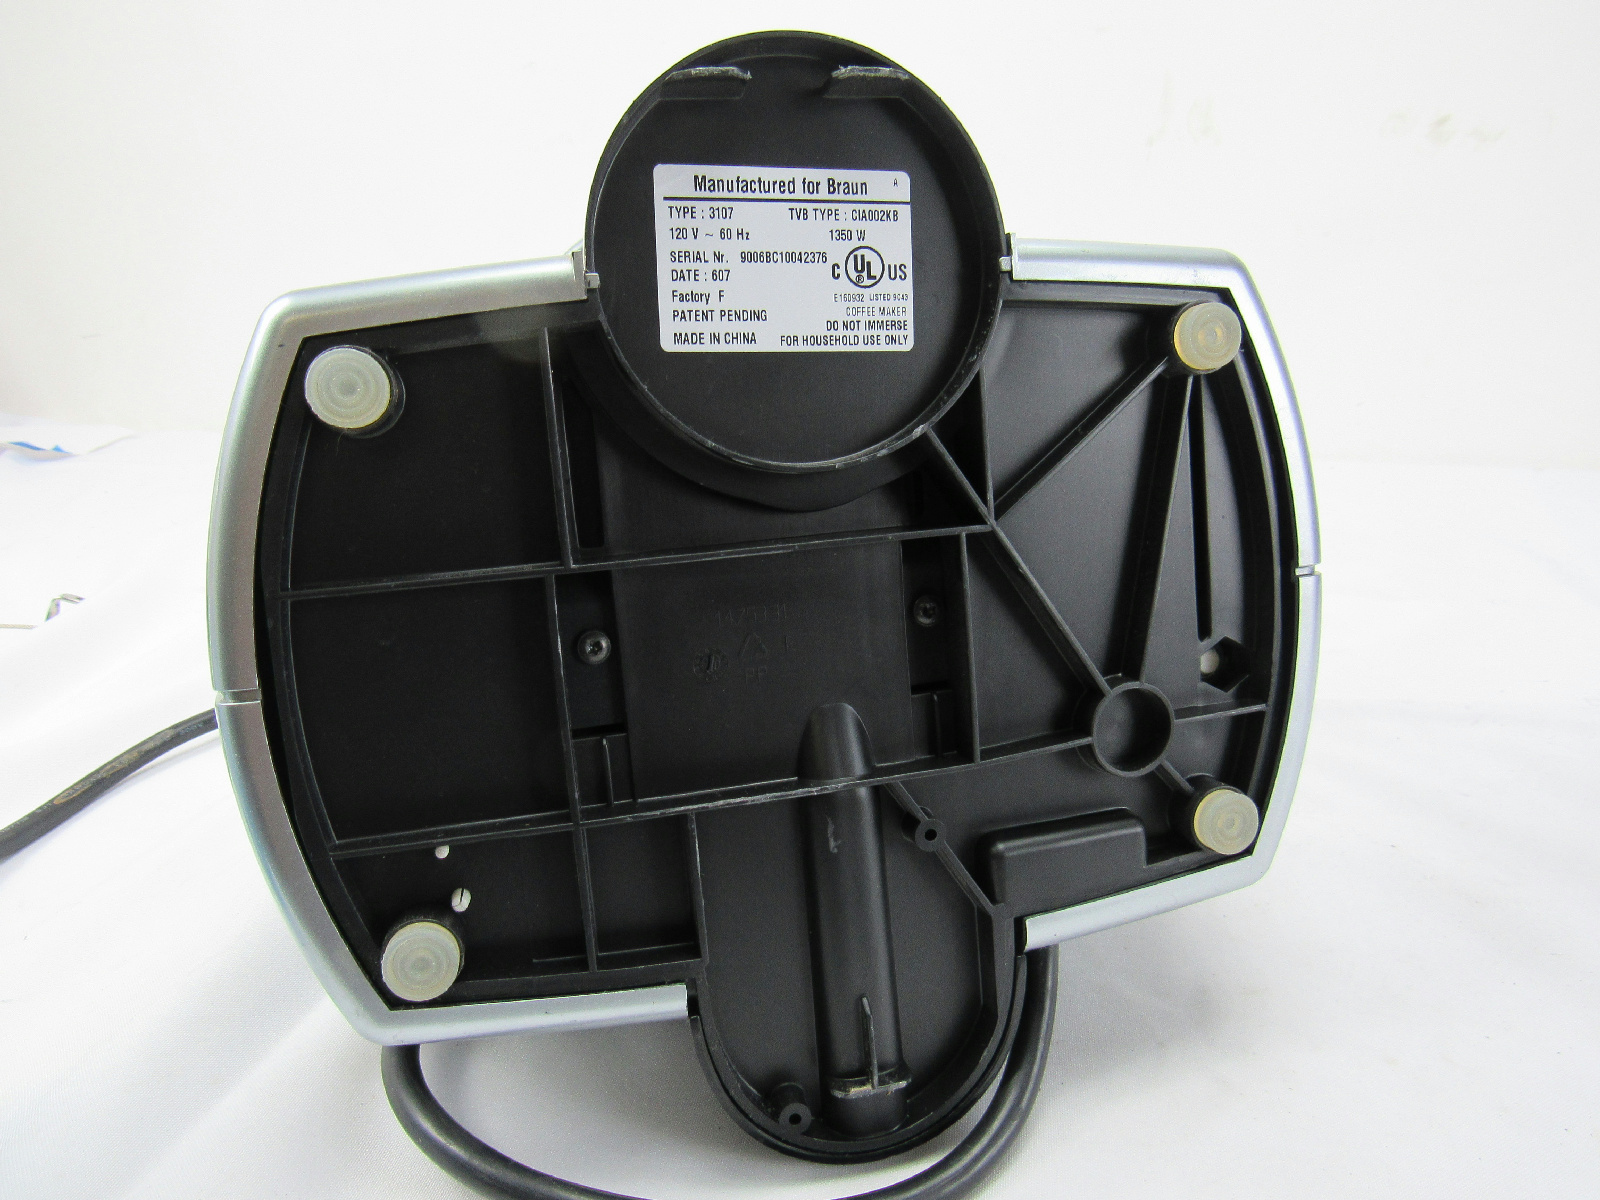 Braun Tassimo Coffee Maker Parts : Braun Tassimo Type 3107 Single Serve T Disc Coffee Maker Base Only eBay